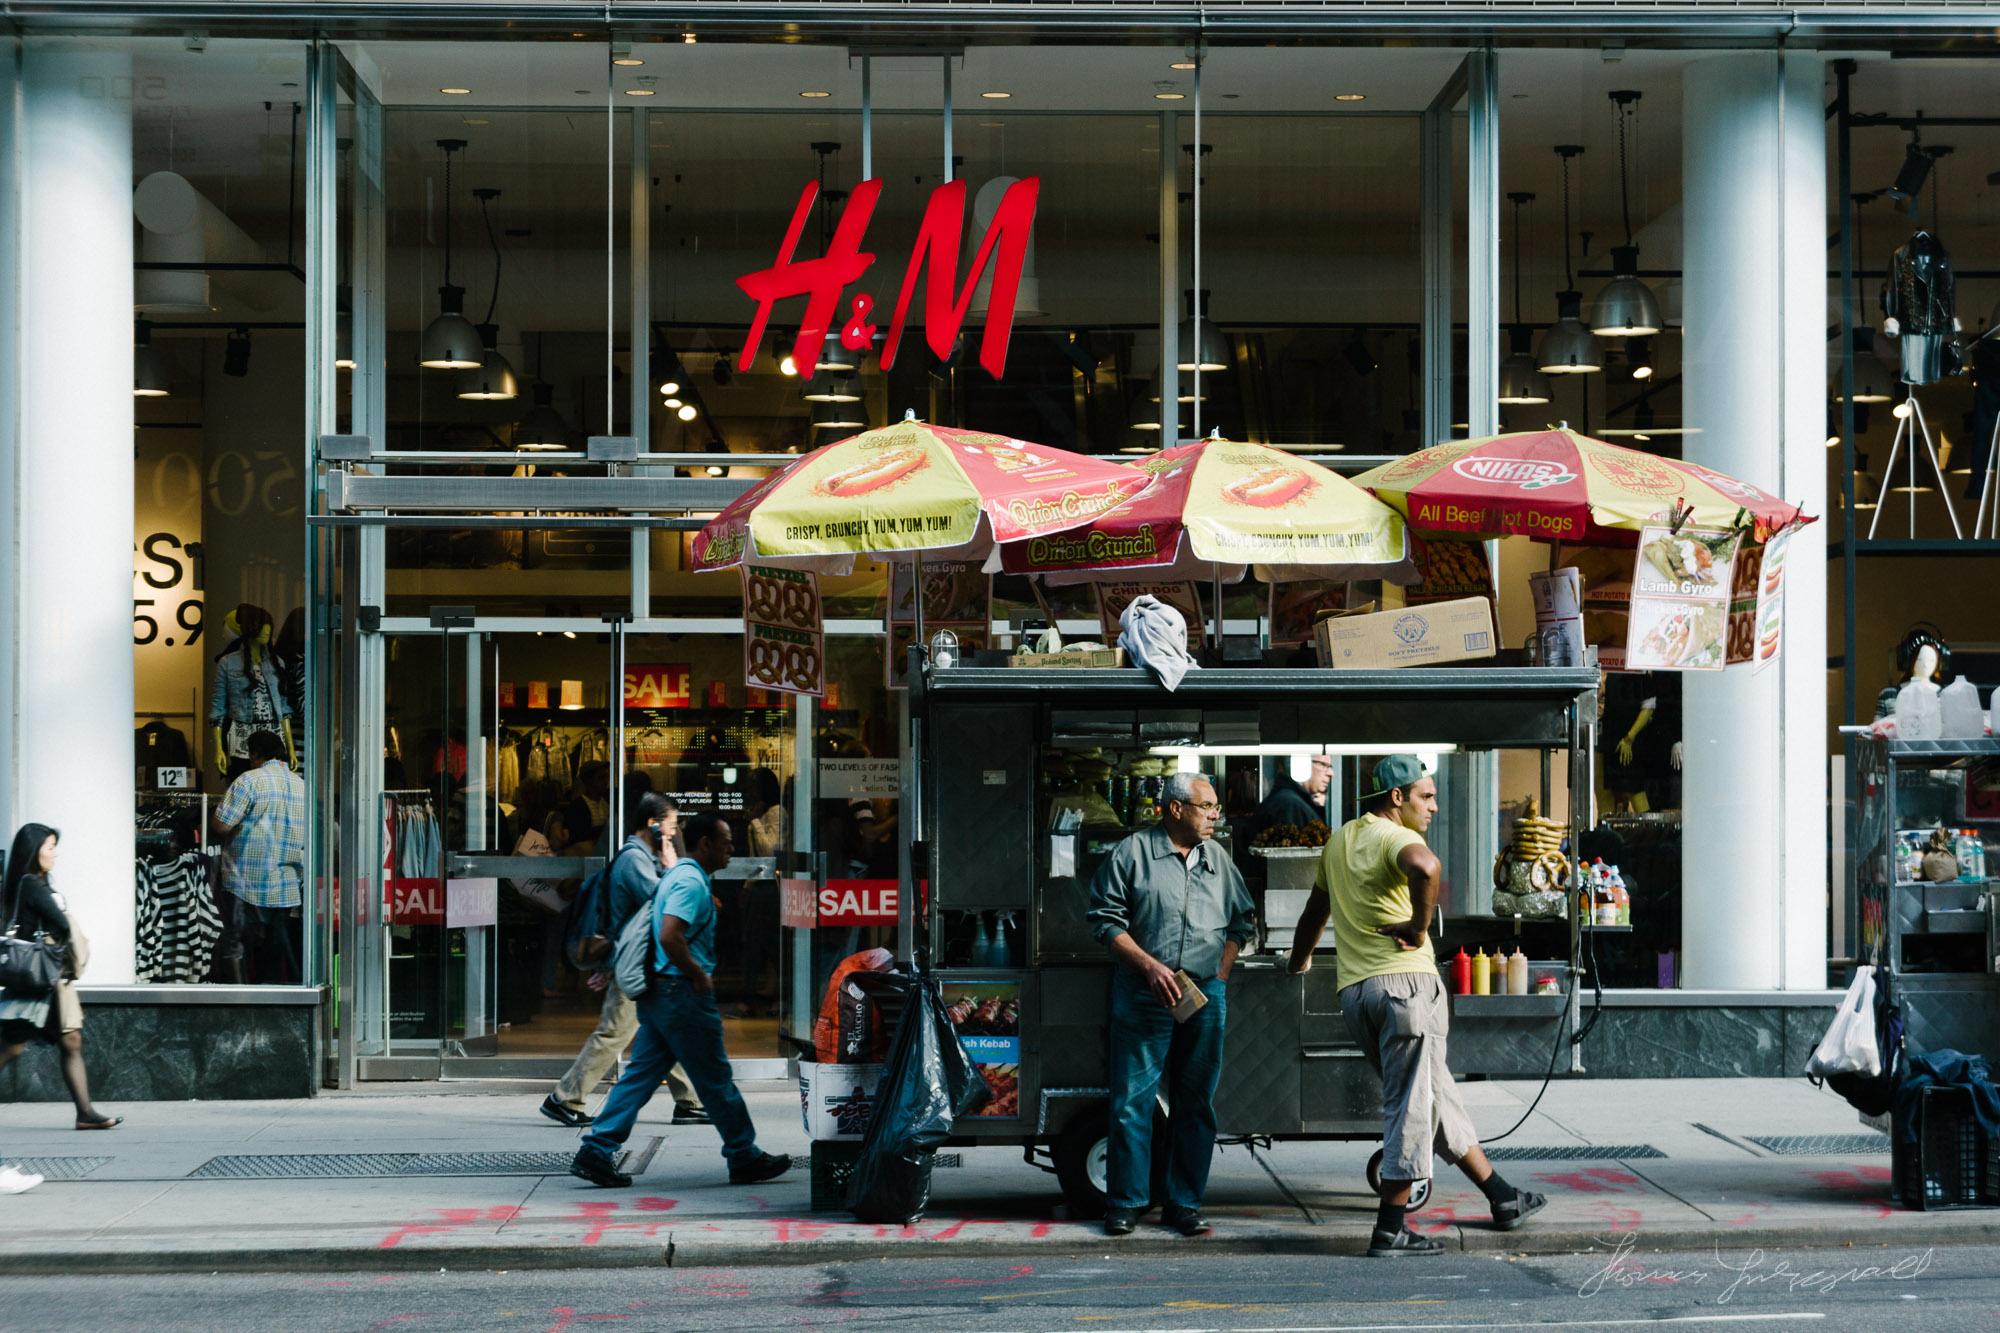 Hot Dog Vendor in New York City